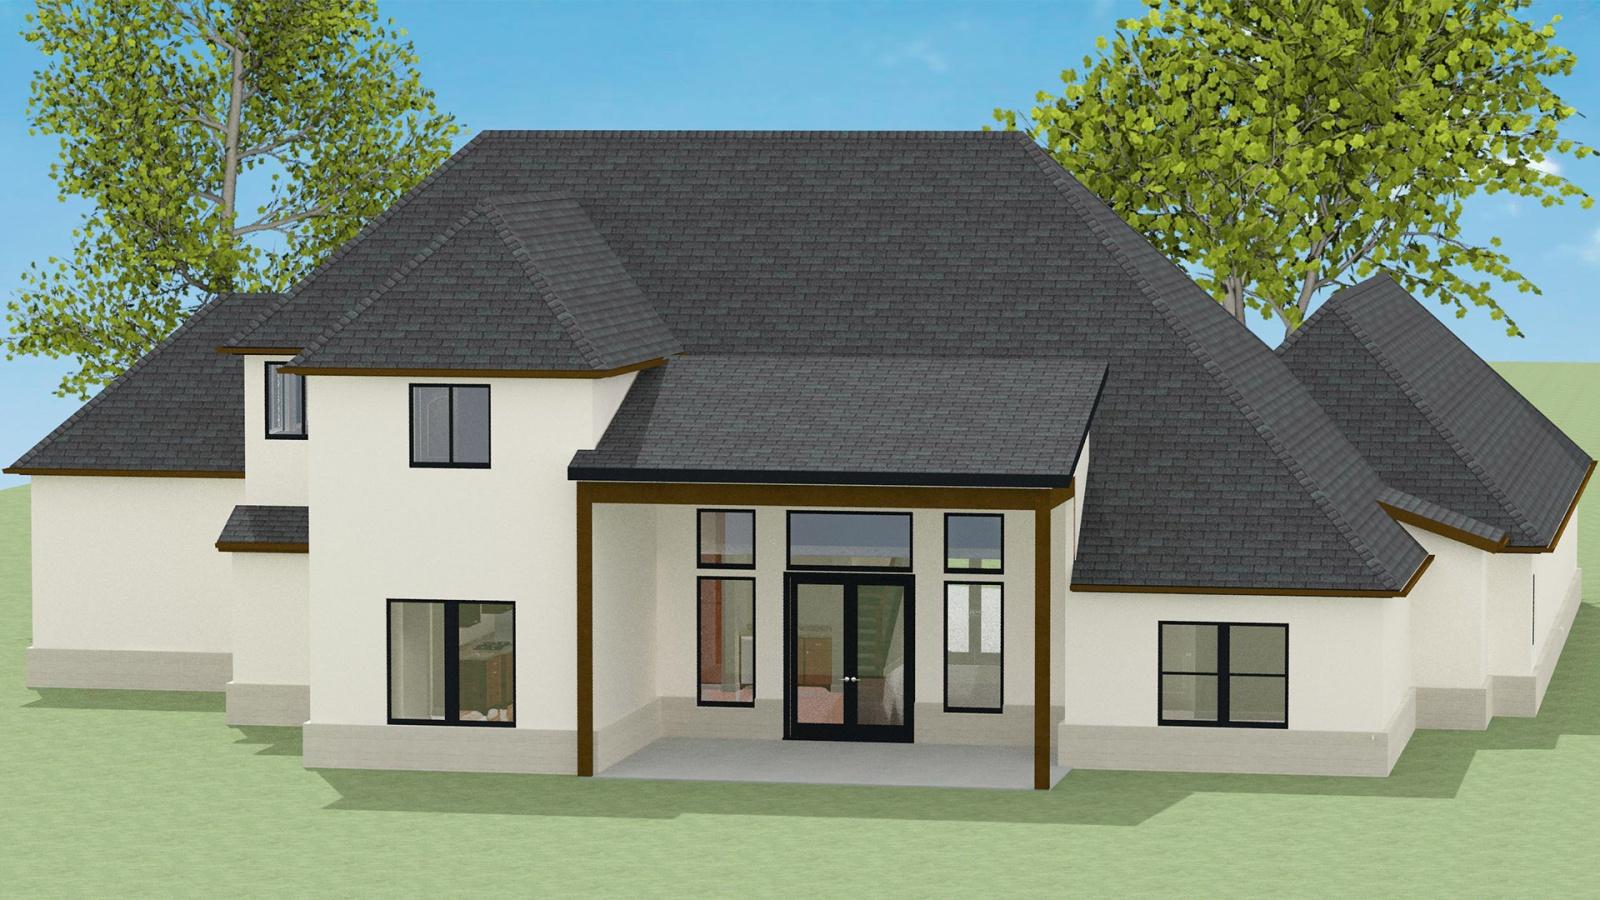 4 Bedrooms Bedrooms, ,3 BathroomsBathrooms,Custom Home,Home Plans,1040